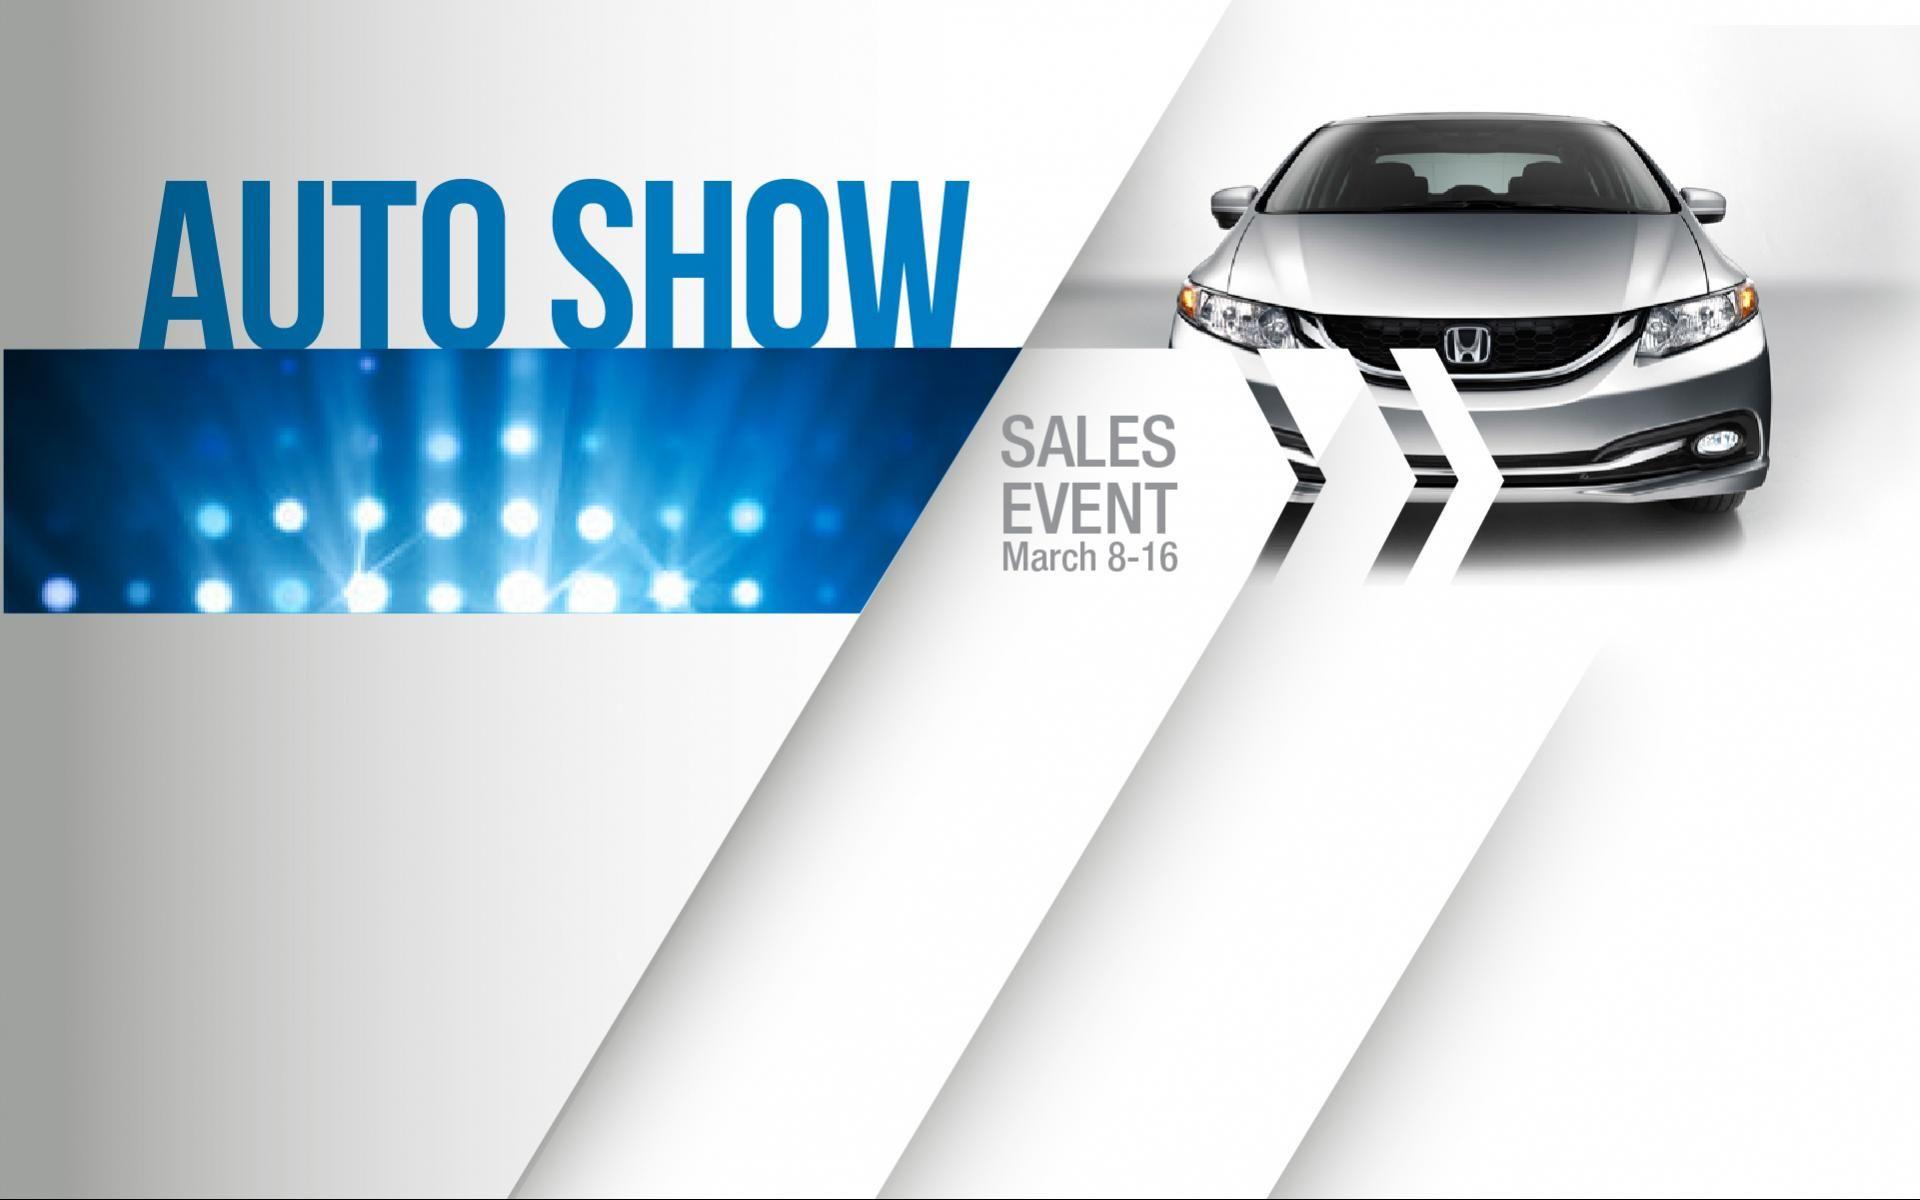 Car Dealerships In Rochester Mn >> Tom Kadlec Honda Auto Show Sales Event Sales